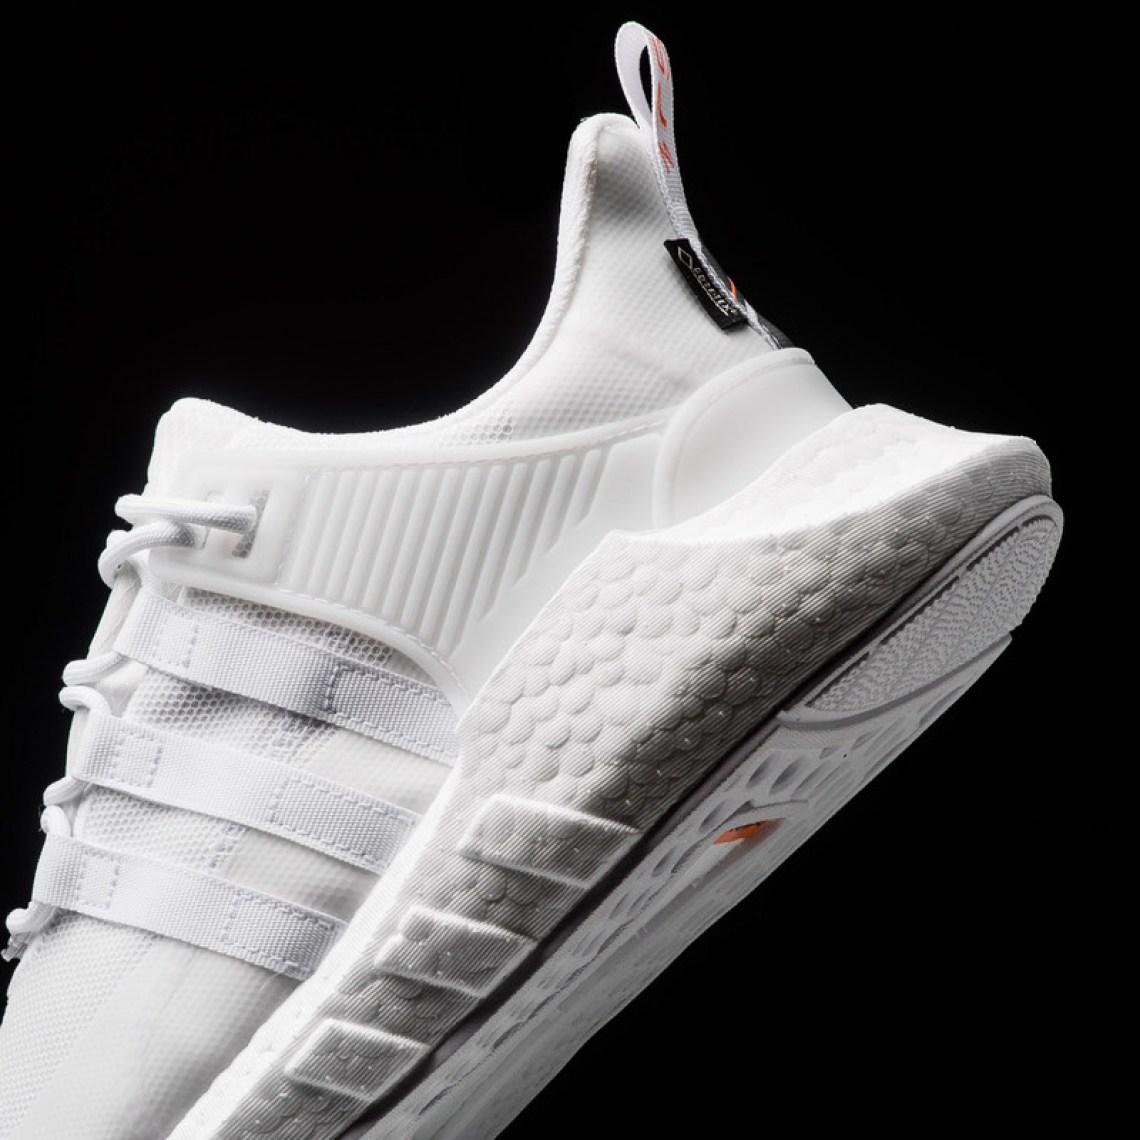 adidas EQT Support 93/17 Drops in New Colors Soon